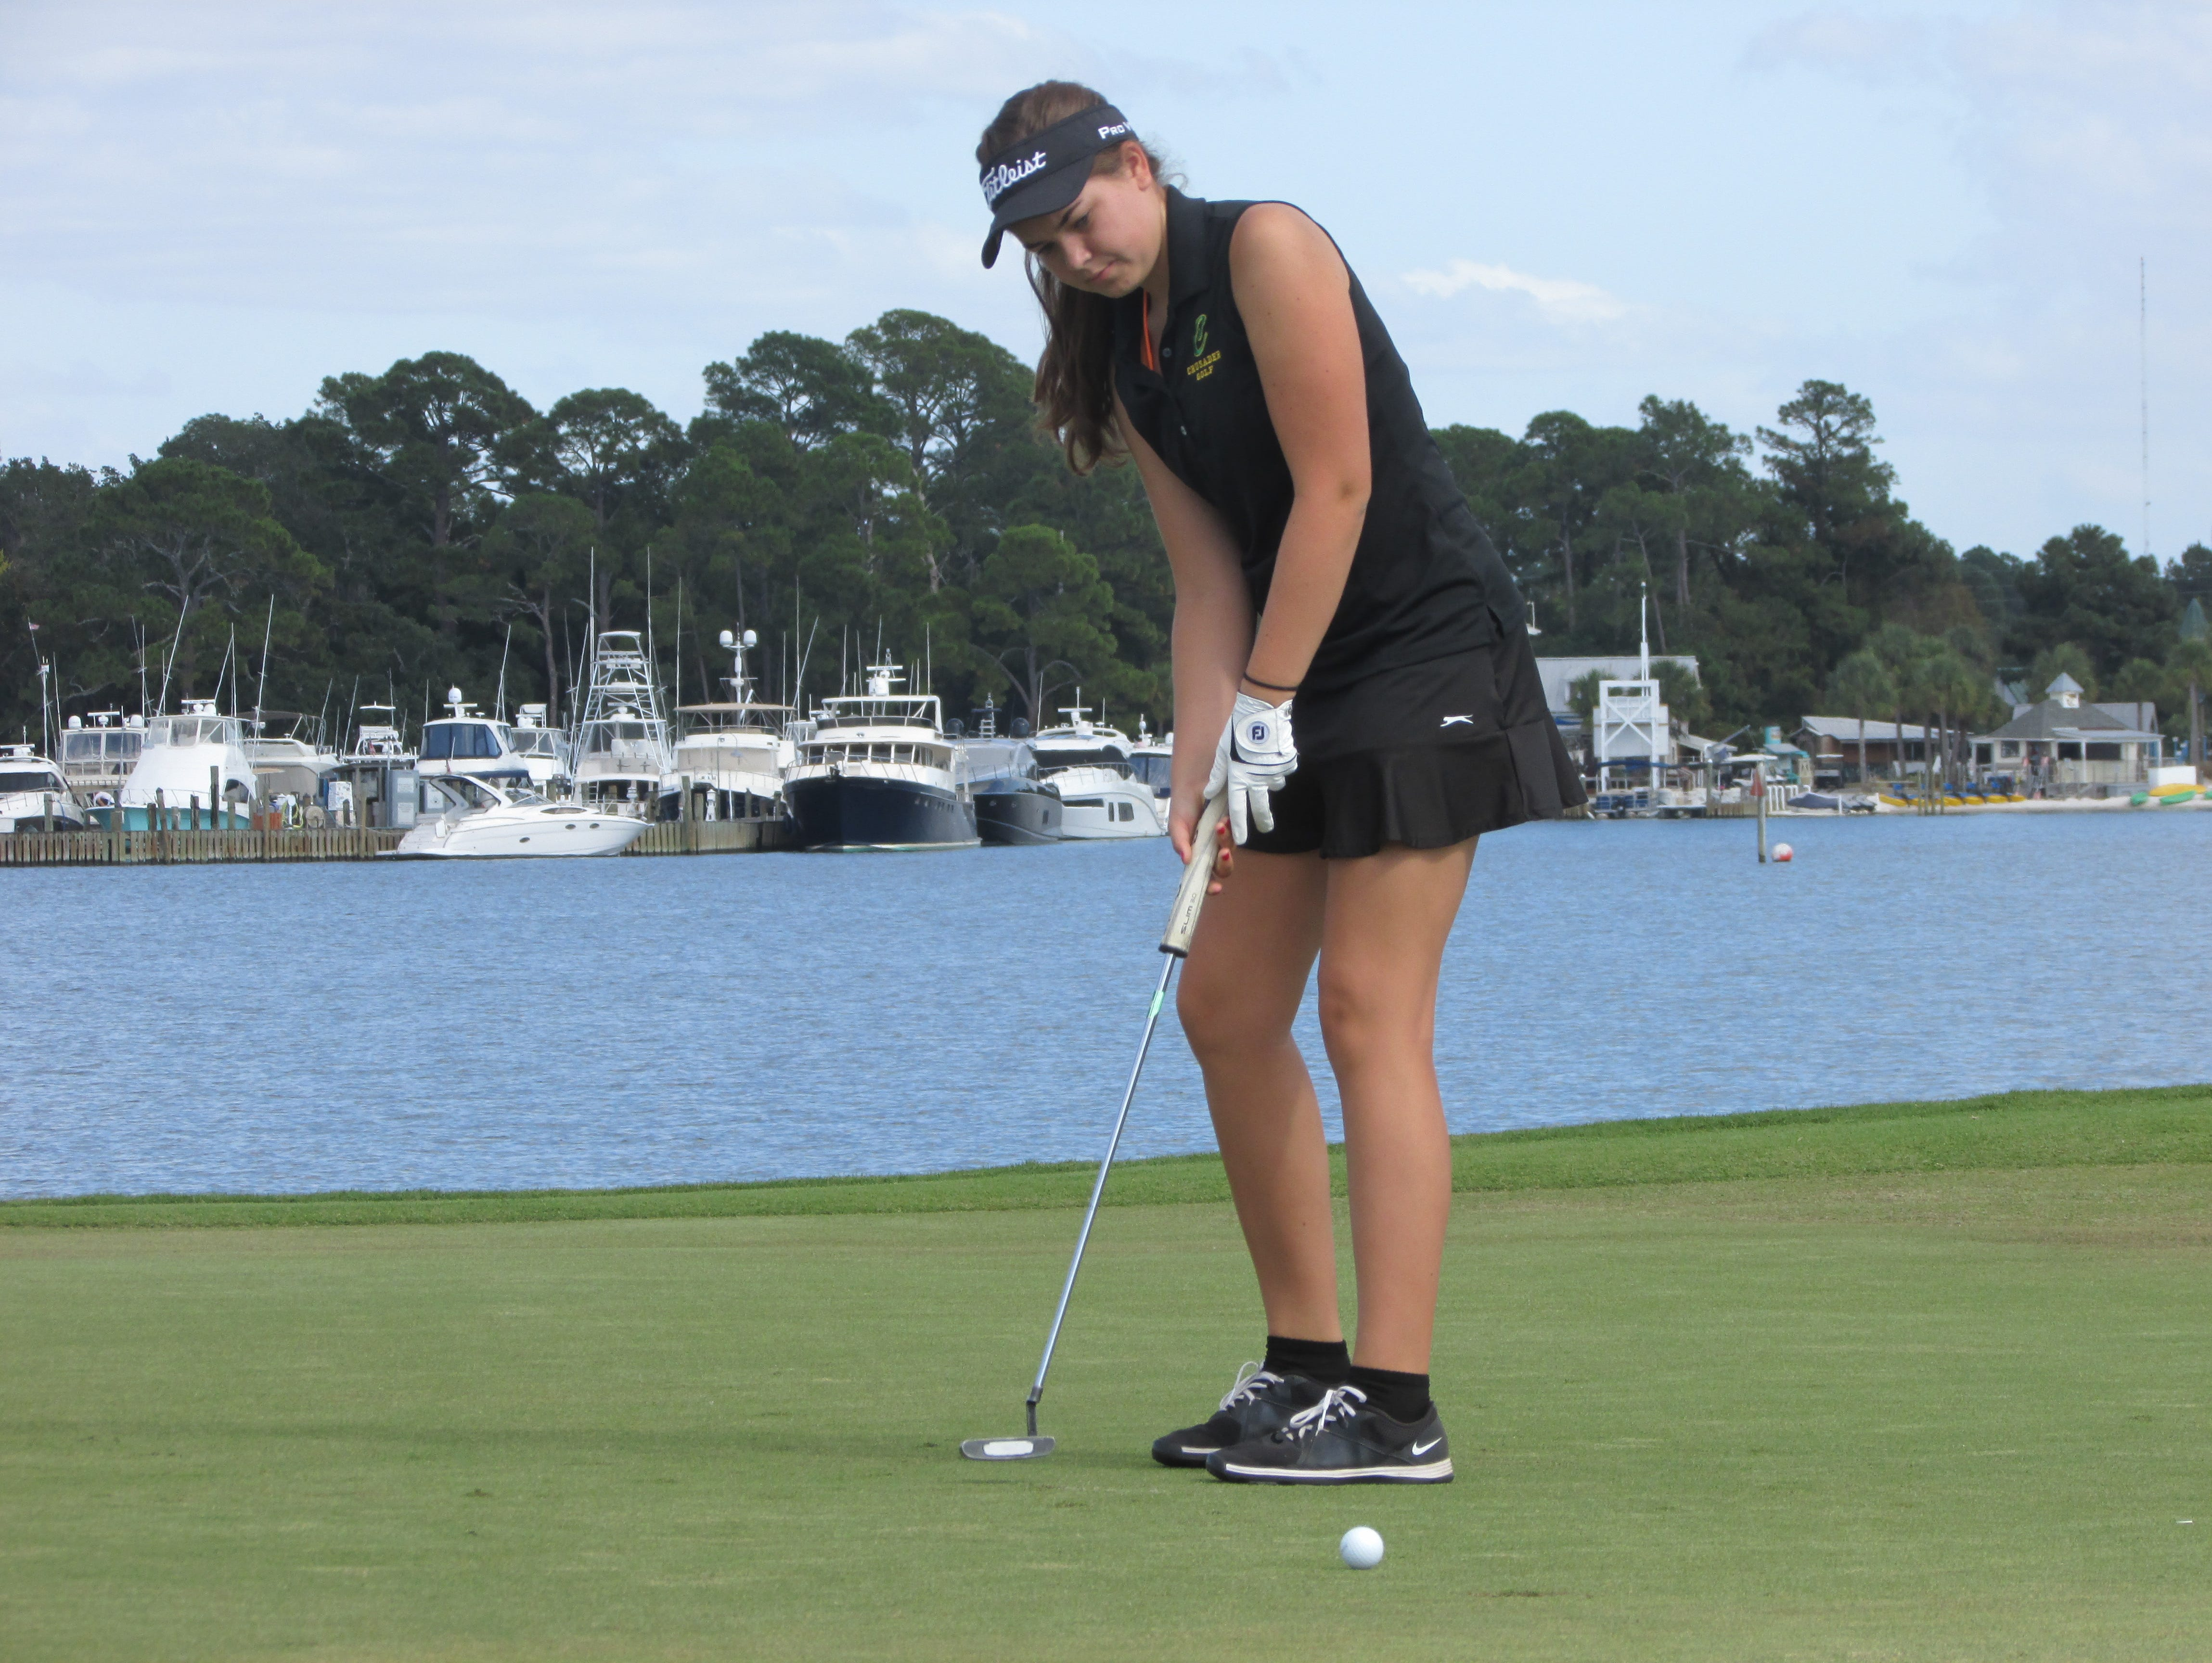 Abby Herrmann follows putt on No. 14 at The Links in Sandestin.